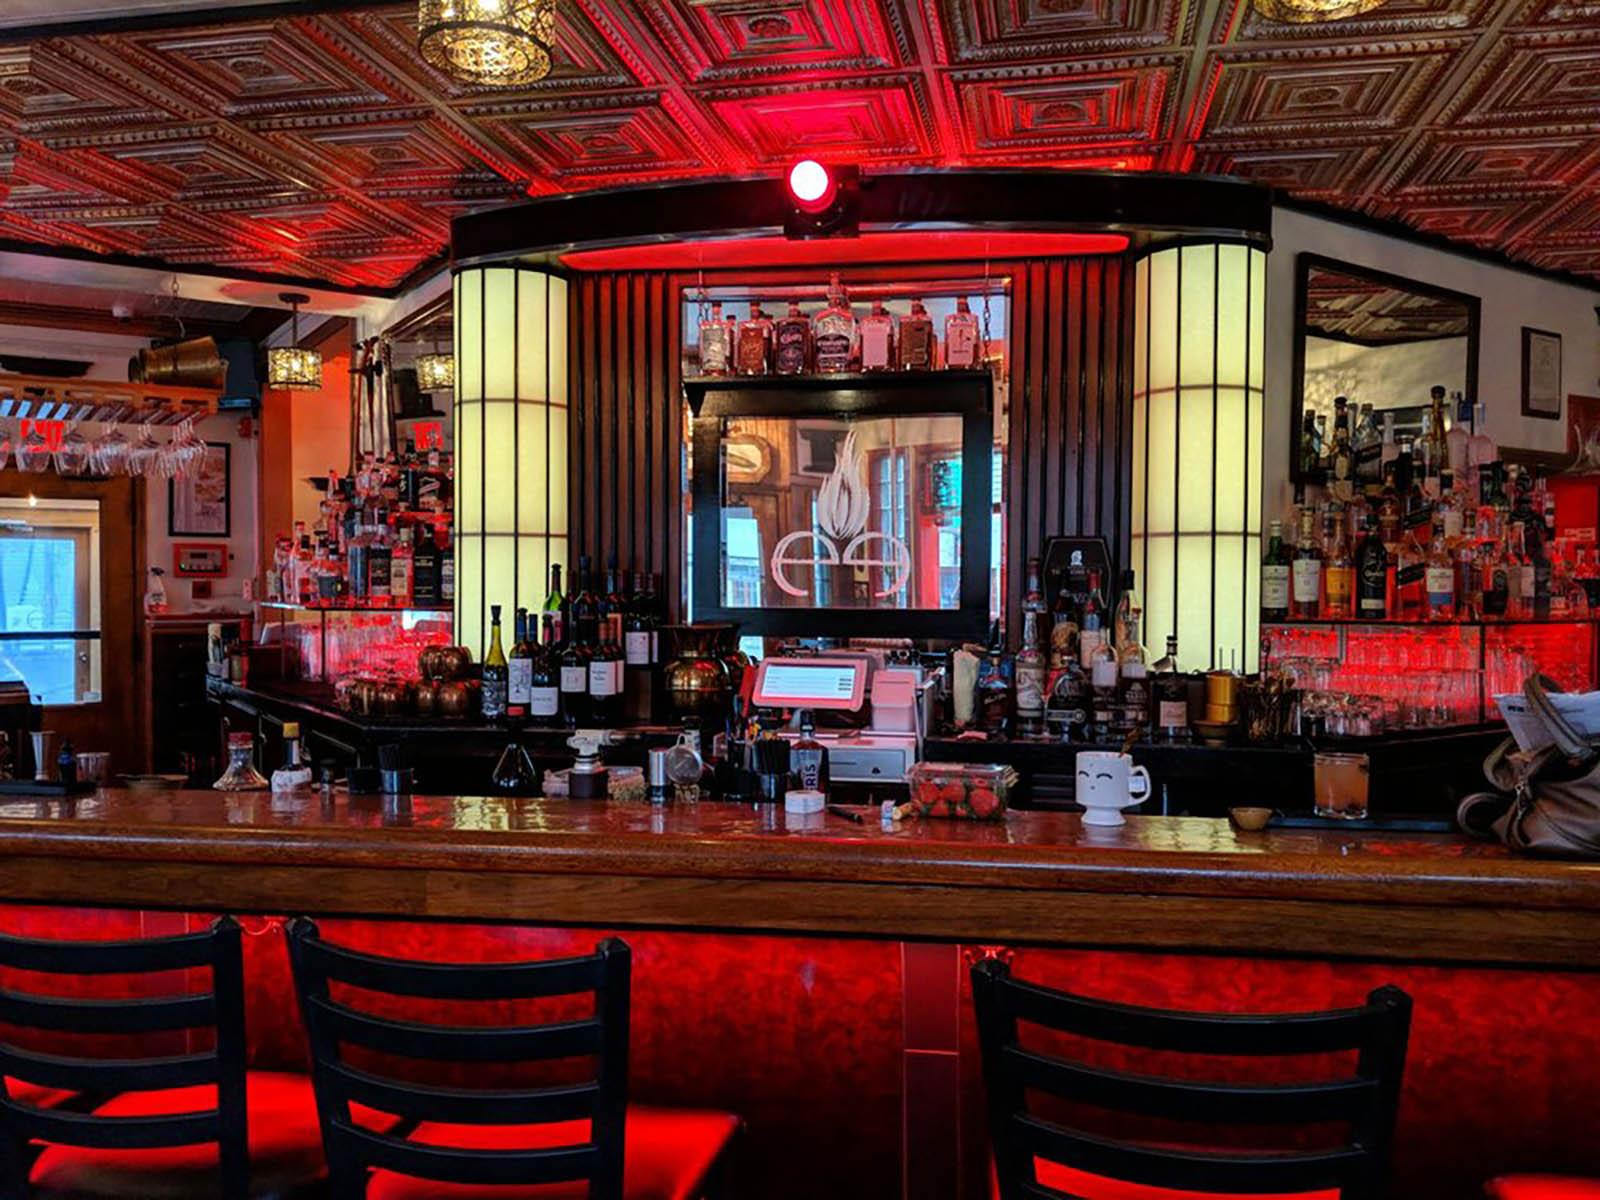 The Cheel back bar